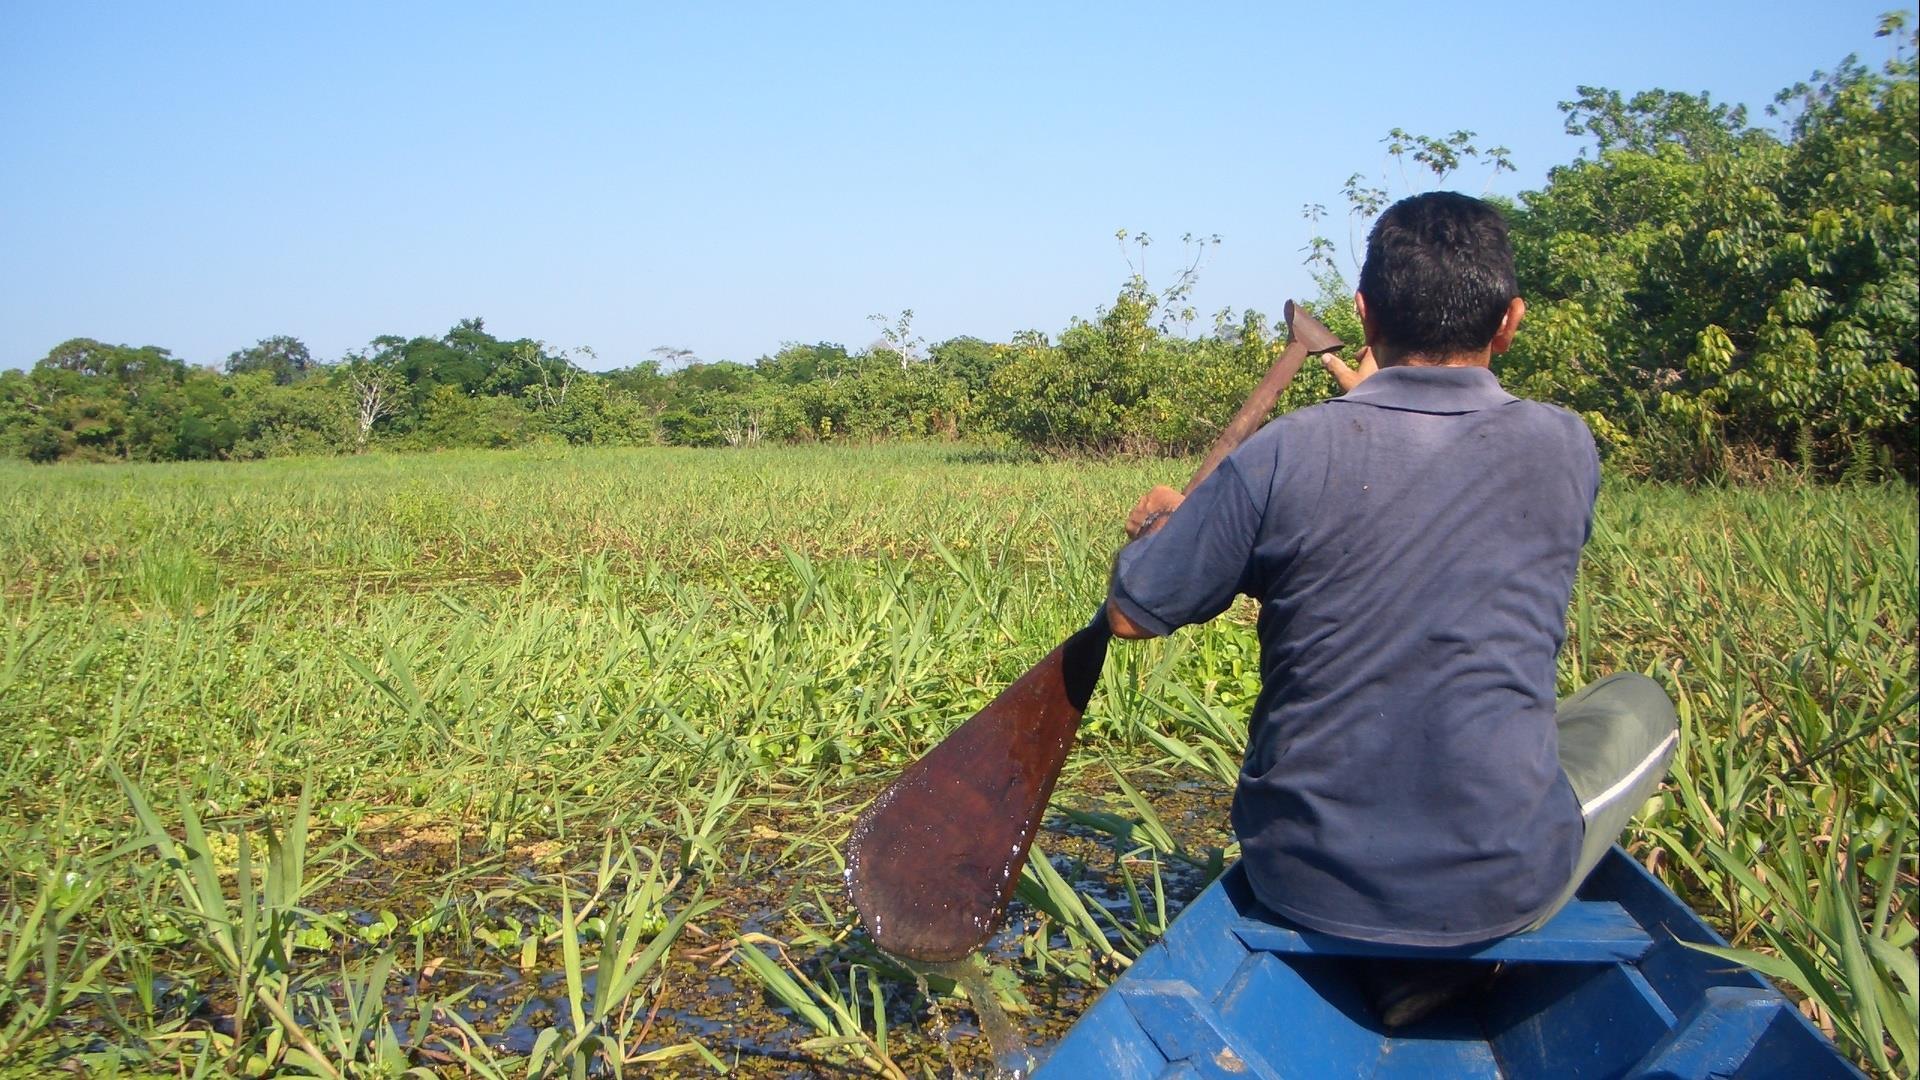 Brasilien Amazonas: 4 Tage Reisebaustein - Turtle Lodge Kayak Expedition